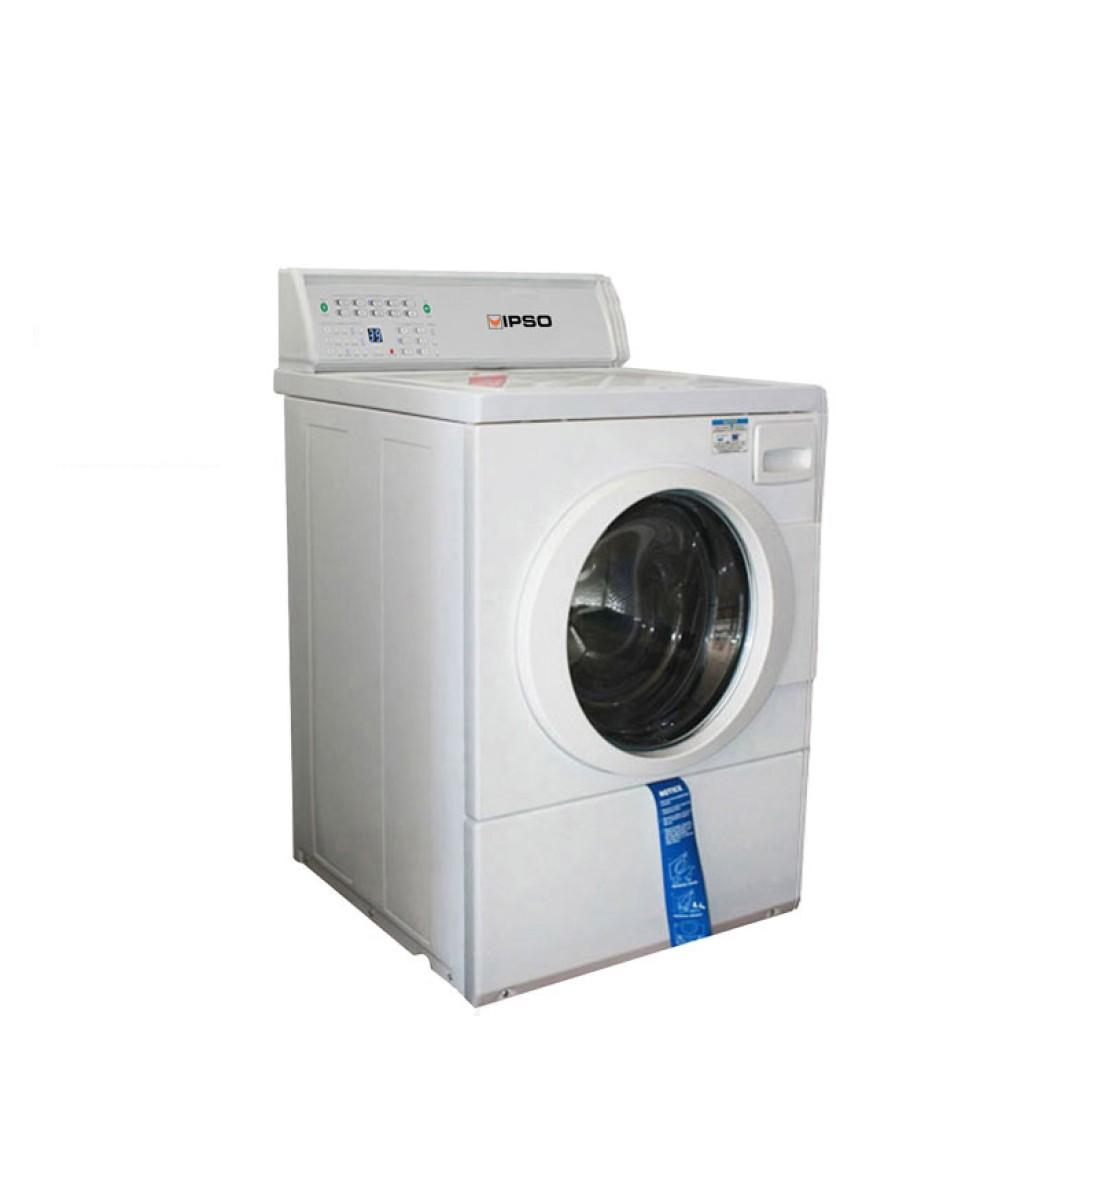 ipso mesin cuci front load ffn kap. 10,5 kg - putih